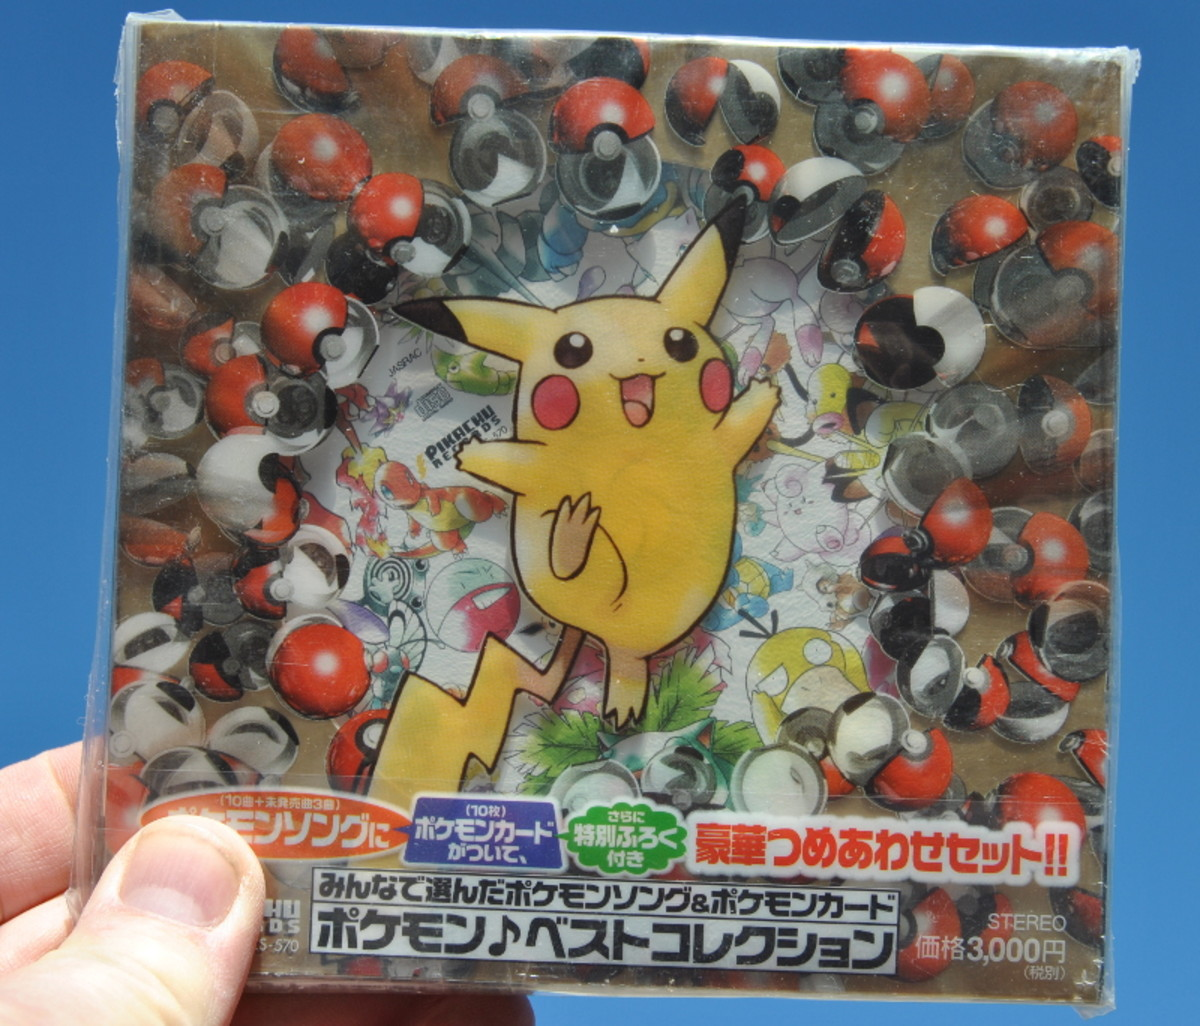 Pokémon Best of CD Collection